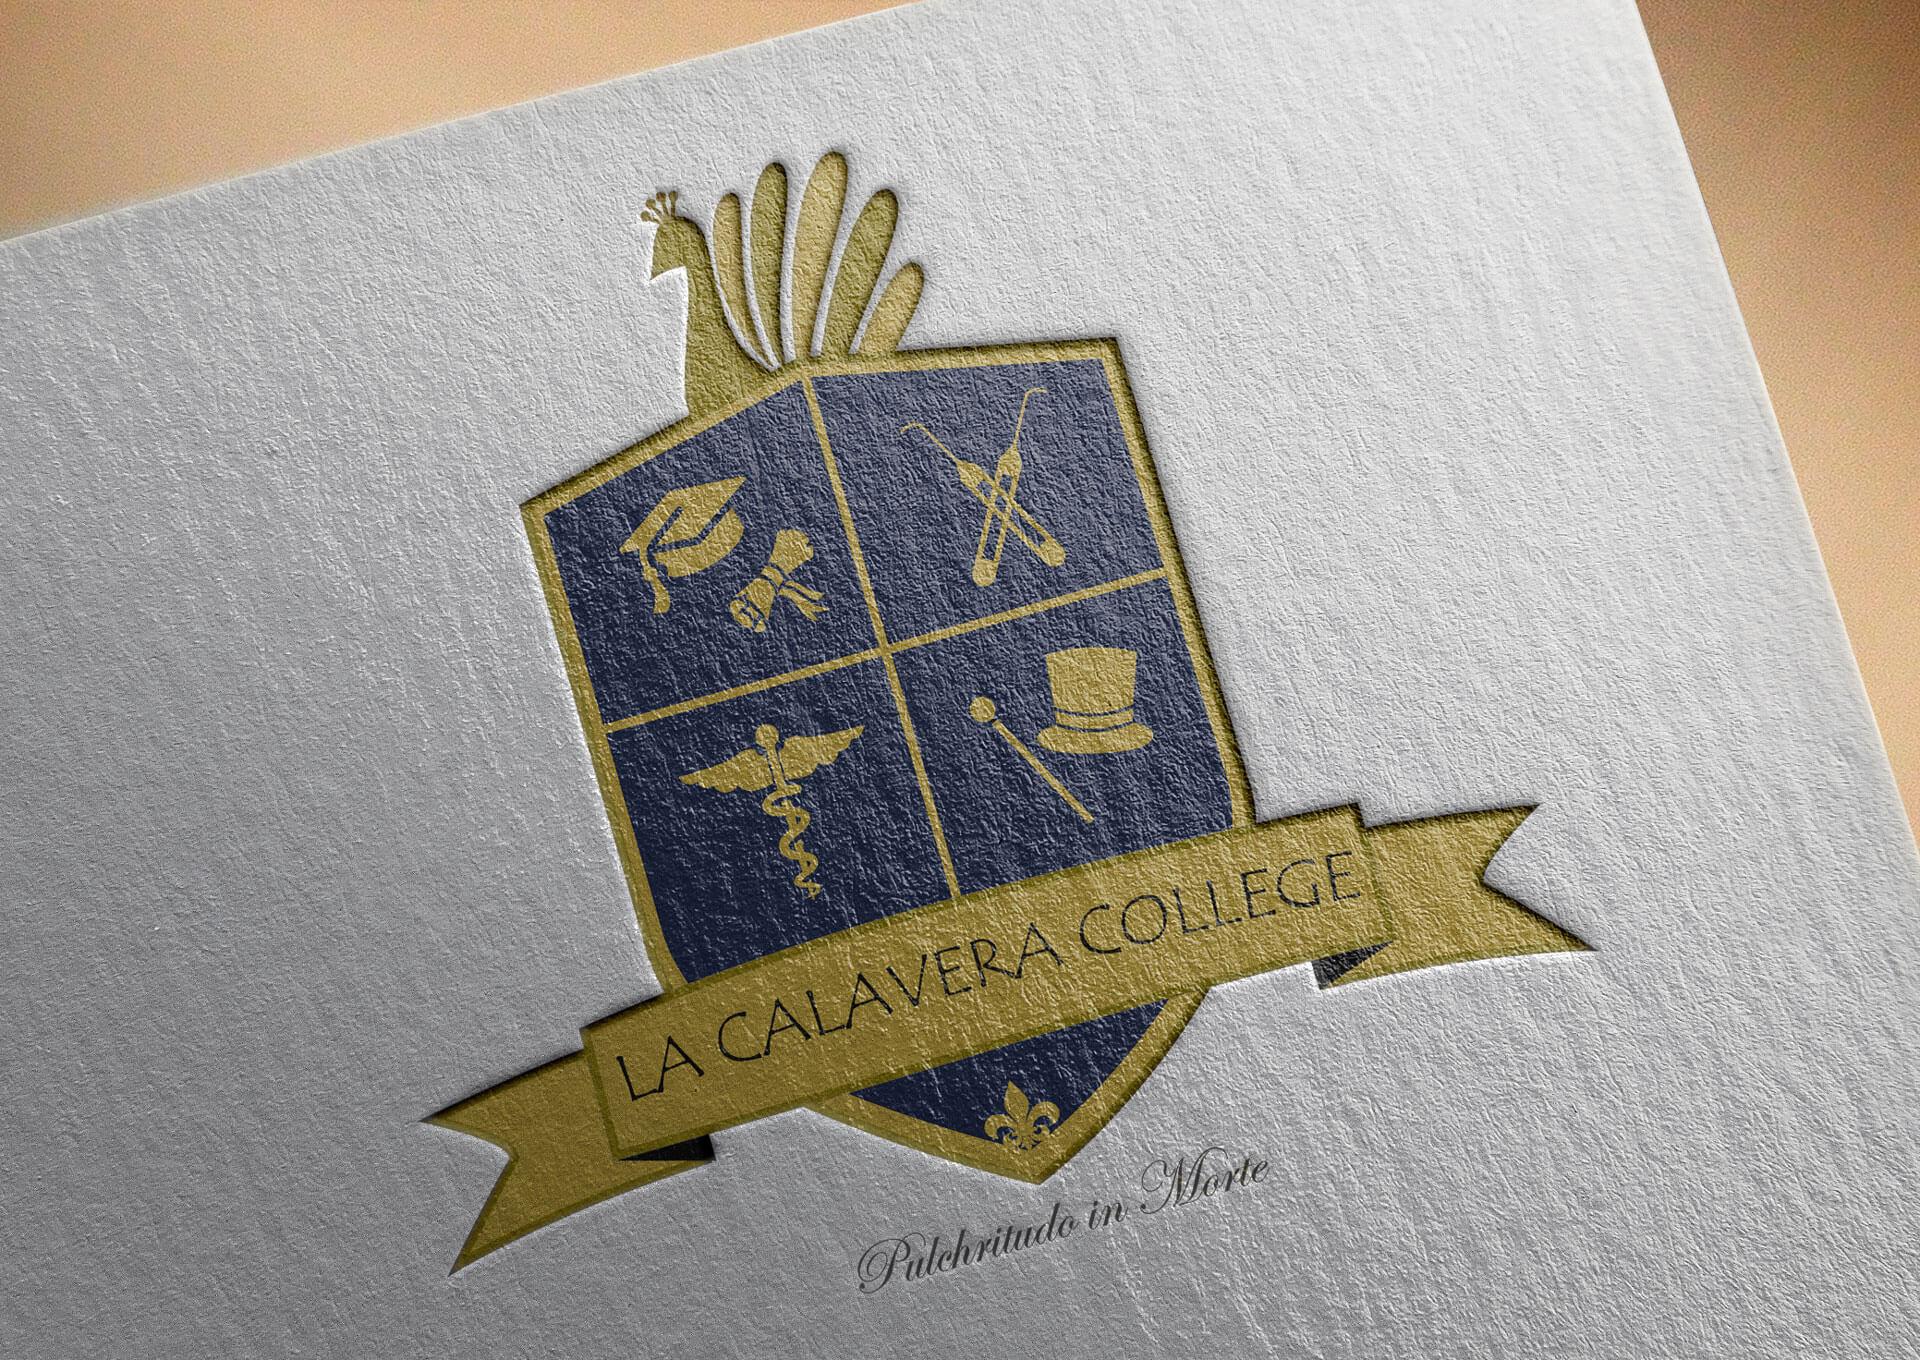 La Calavera College Logo Design